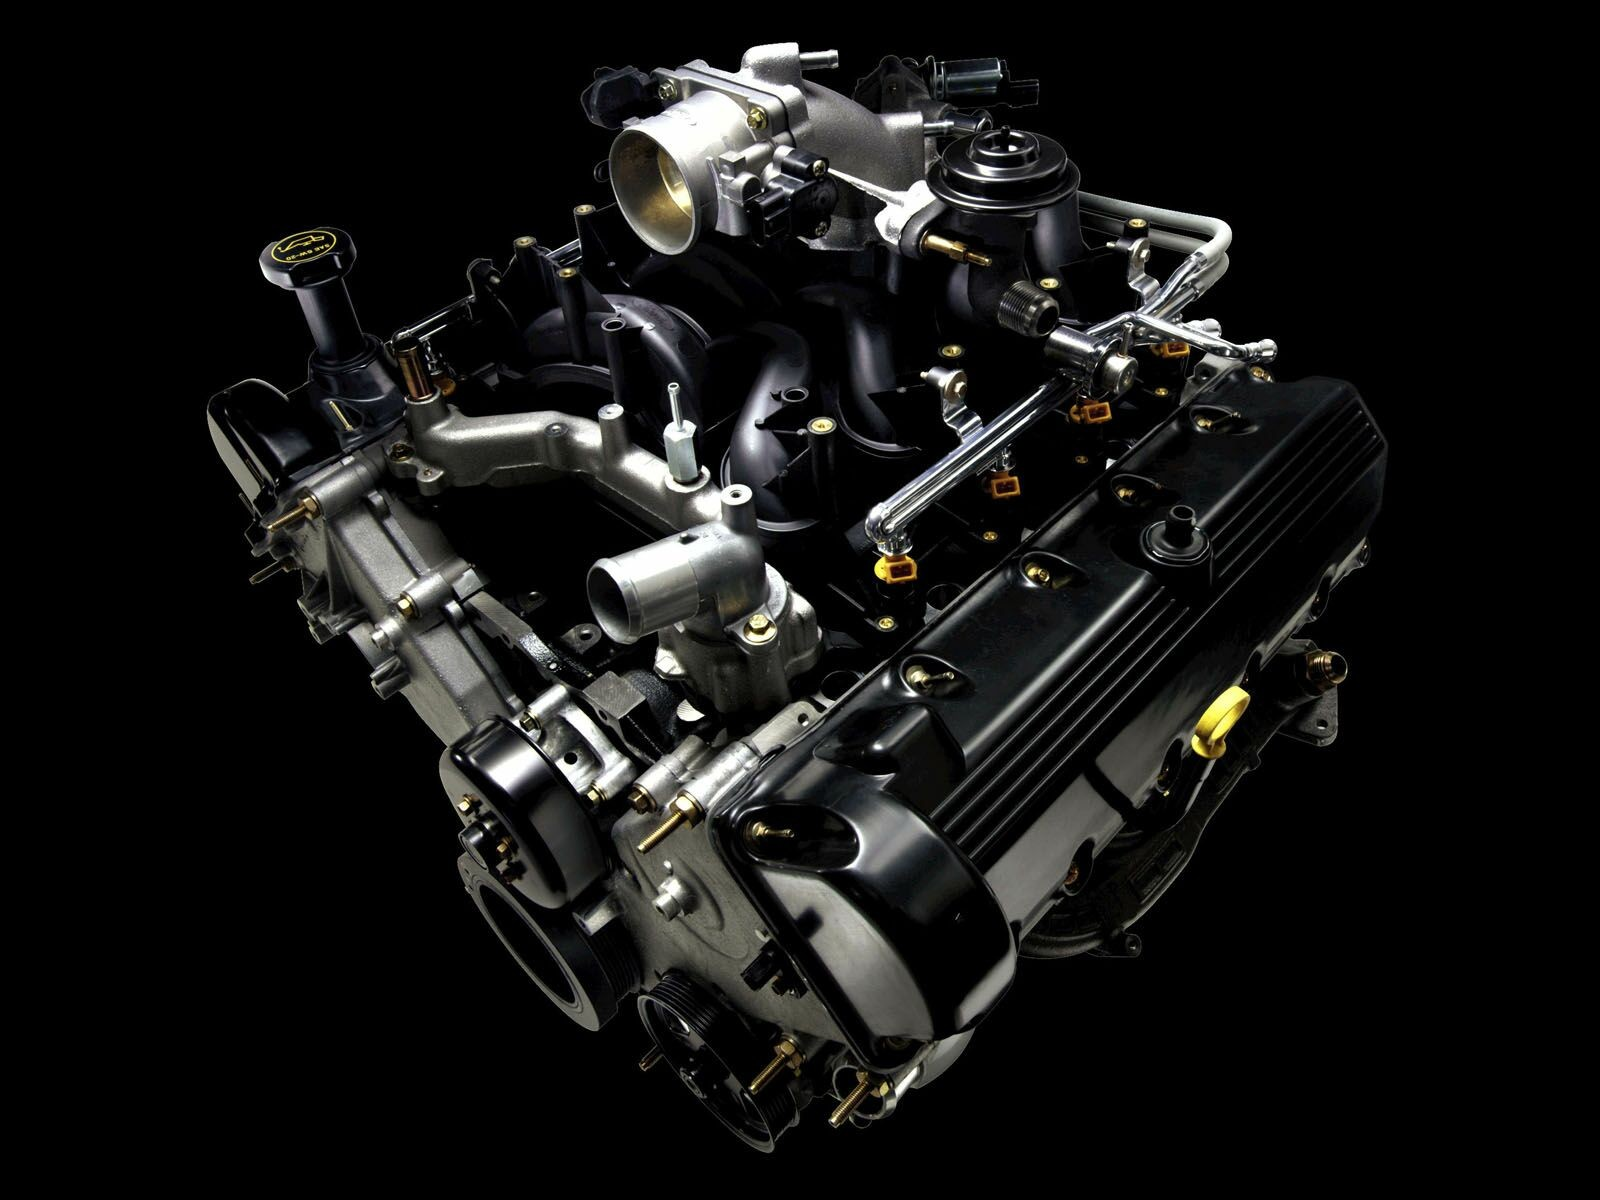 ... Engine Wallpaper; Engine Wallpaper